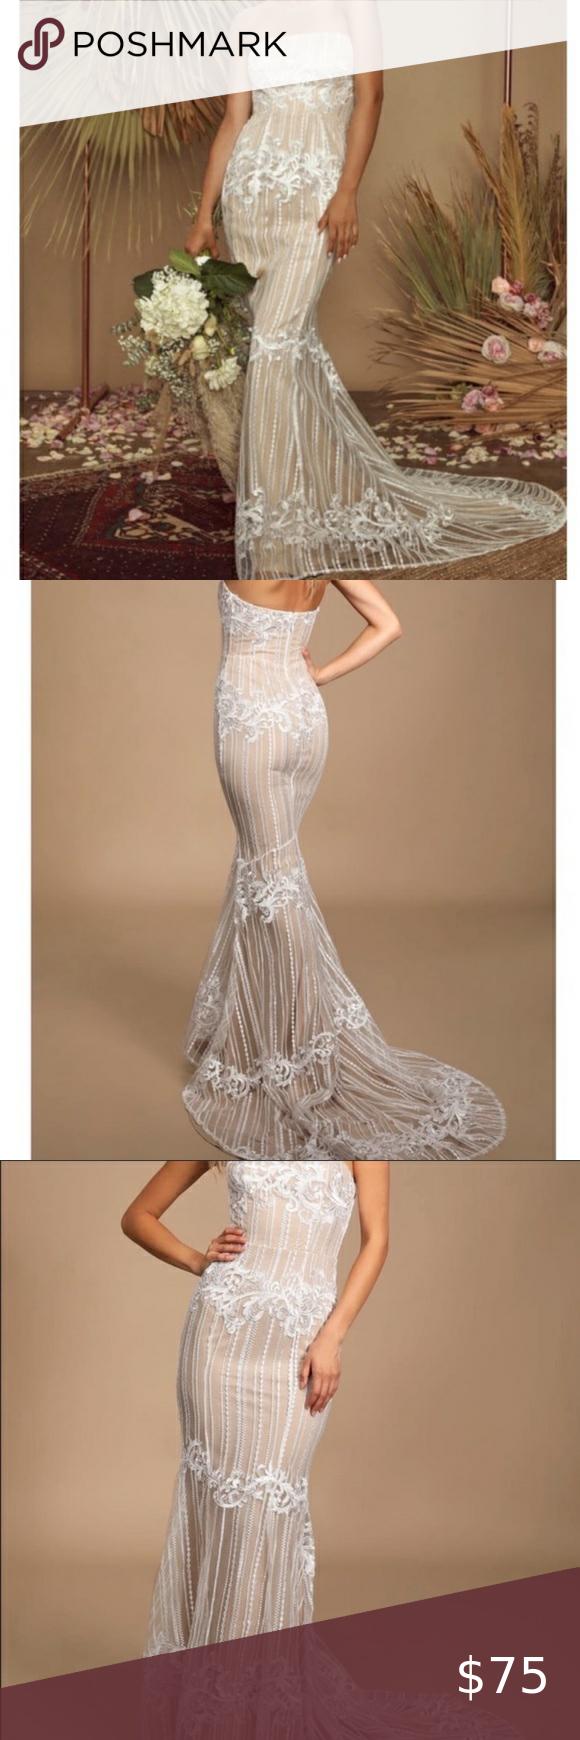 Nwt Lulu S Strapless Tan White Dress With Train Curvy Petite Fashion Dresses Celebrity Dresses [ 1740 x 580 Pixel ]